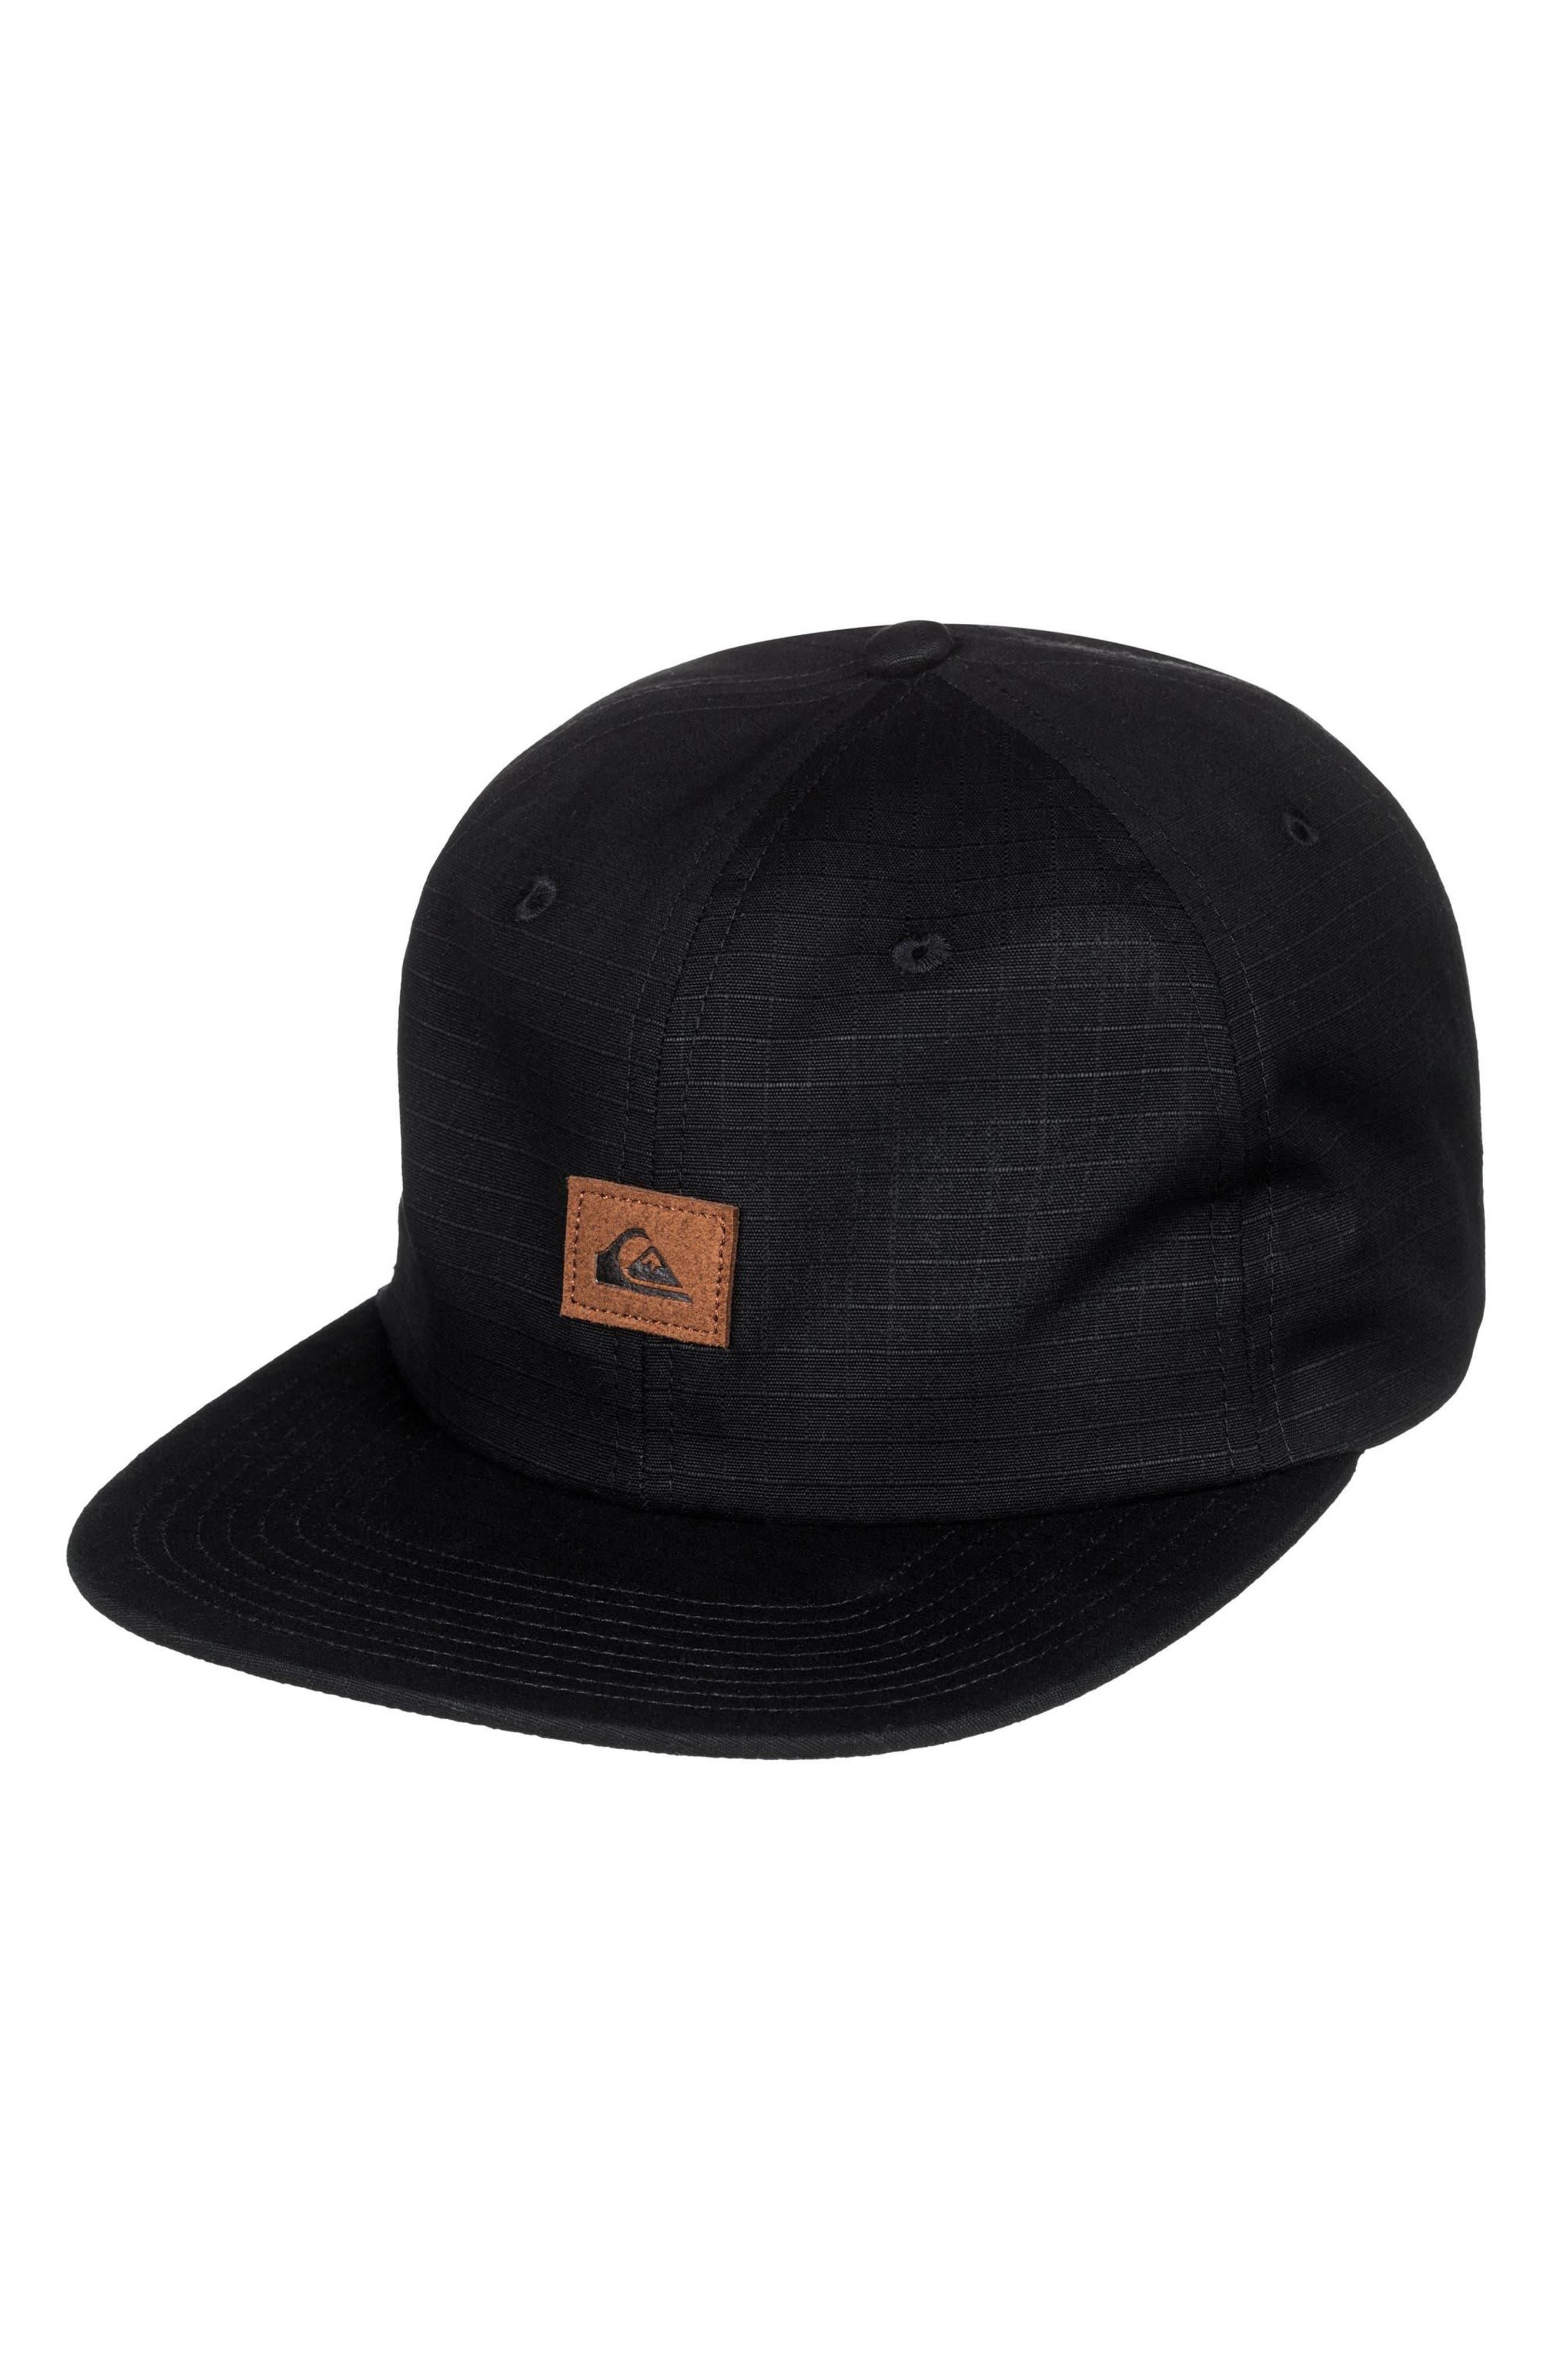 Cascades Ripstop Cap,                         Main,                         color, Black